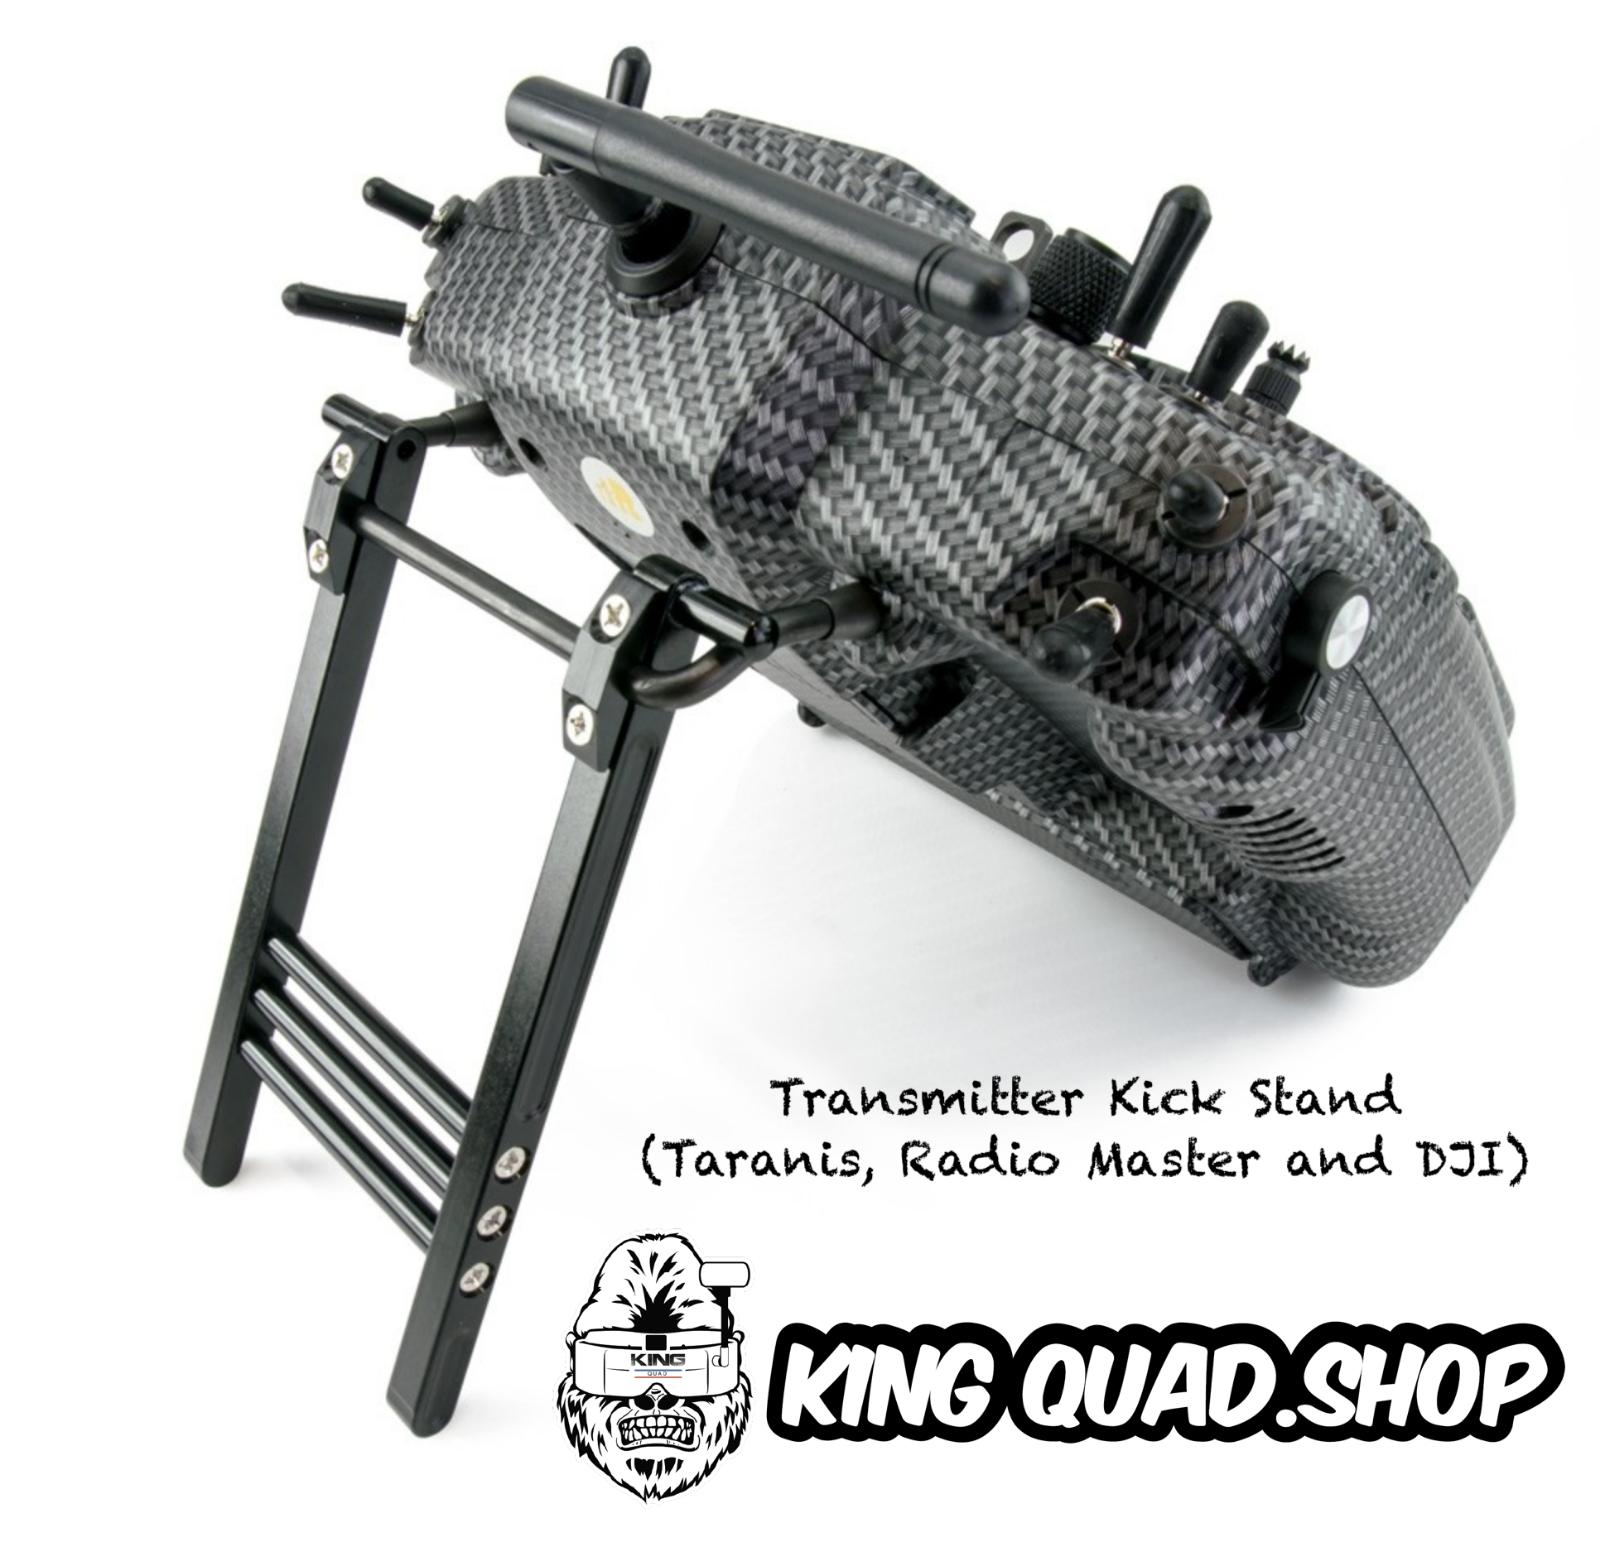 Transmitter Kick Stand for Taranis, Radio Master and DJI Controllers